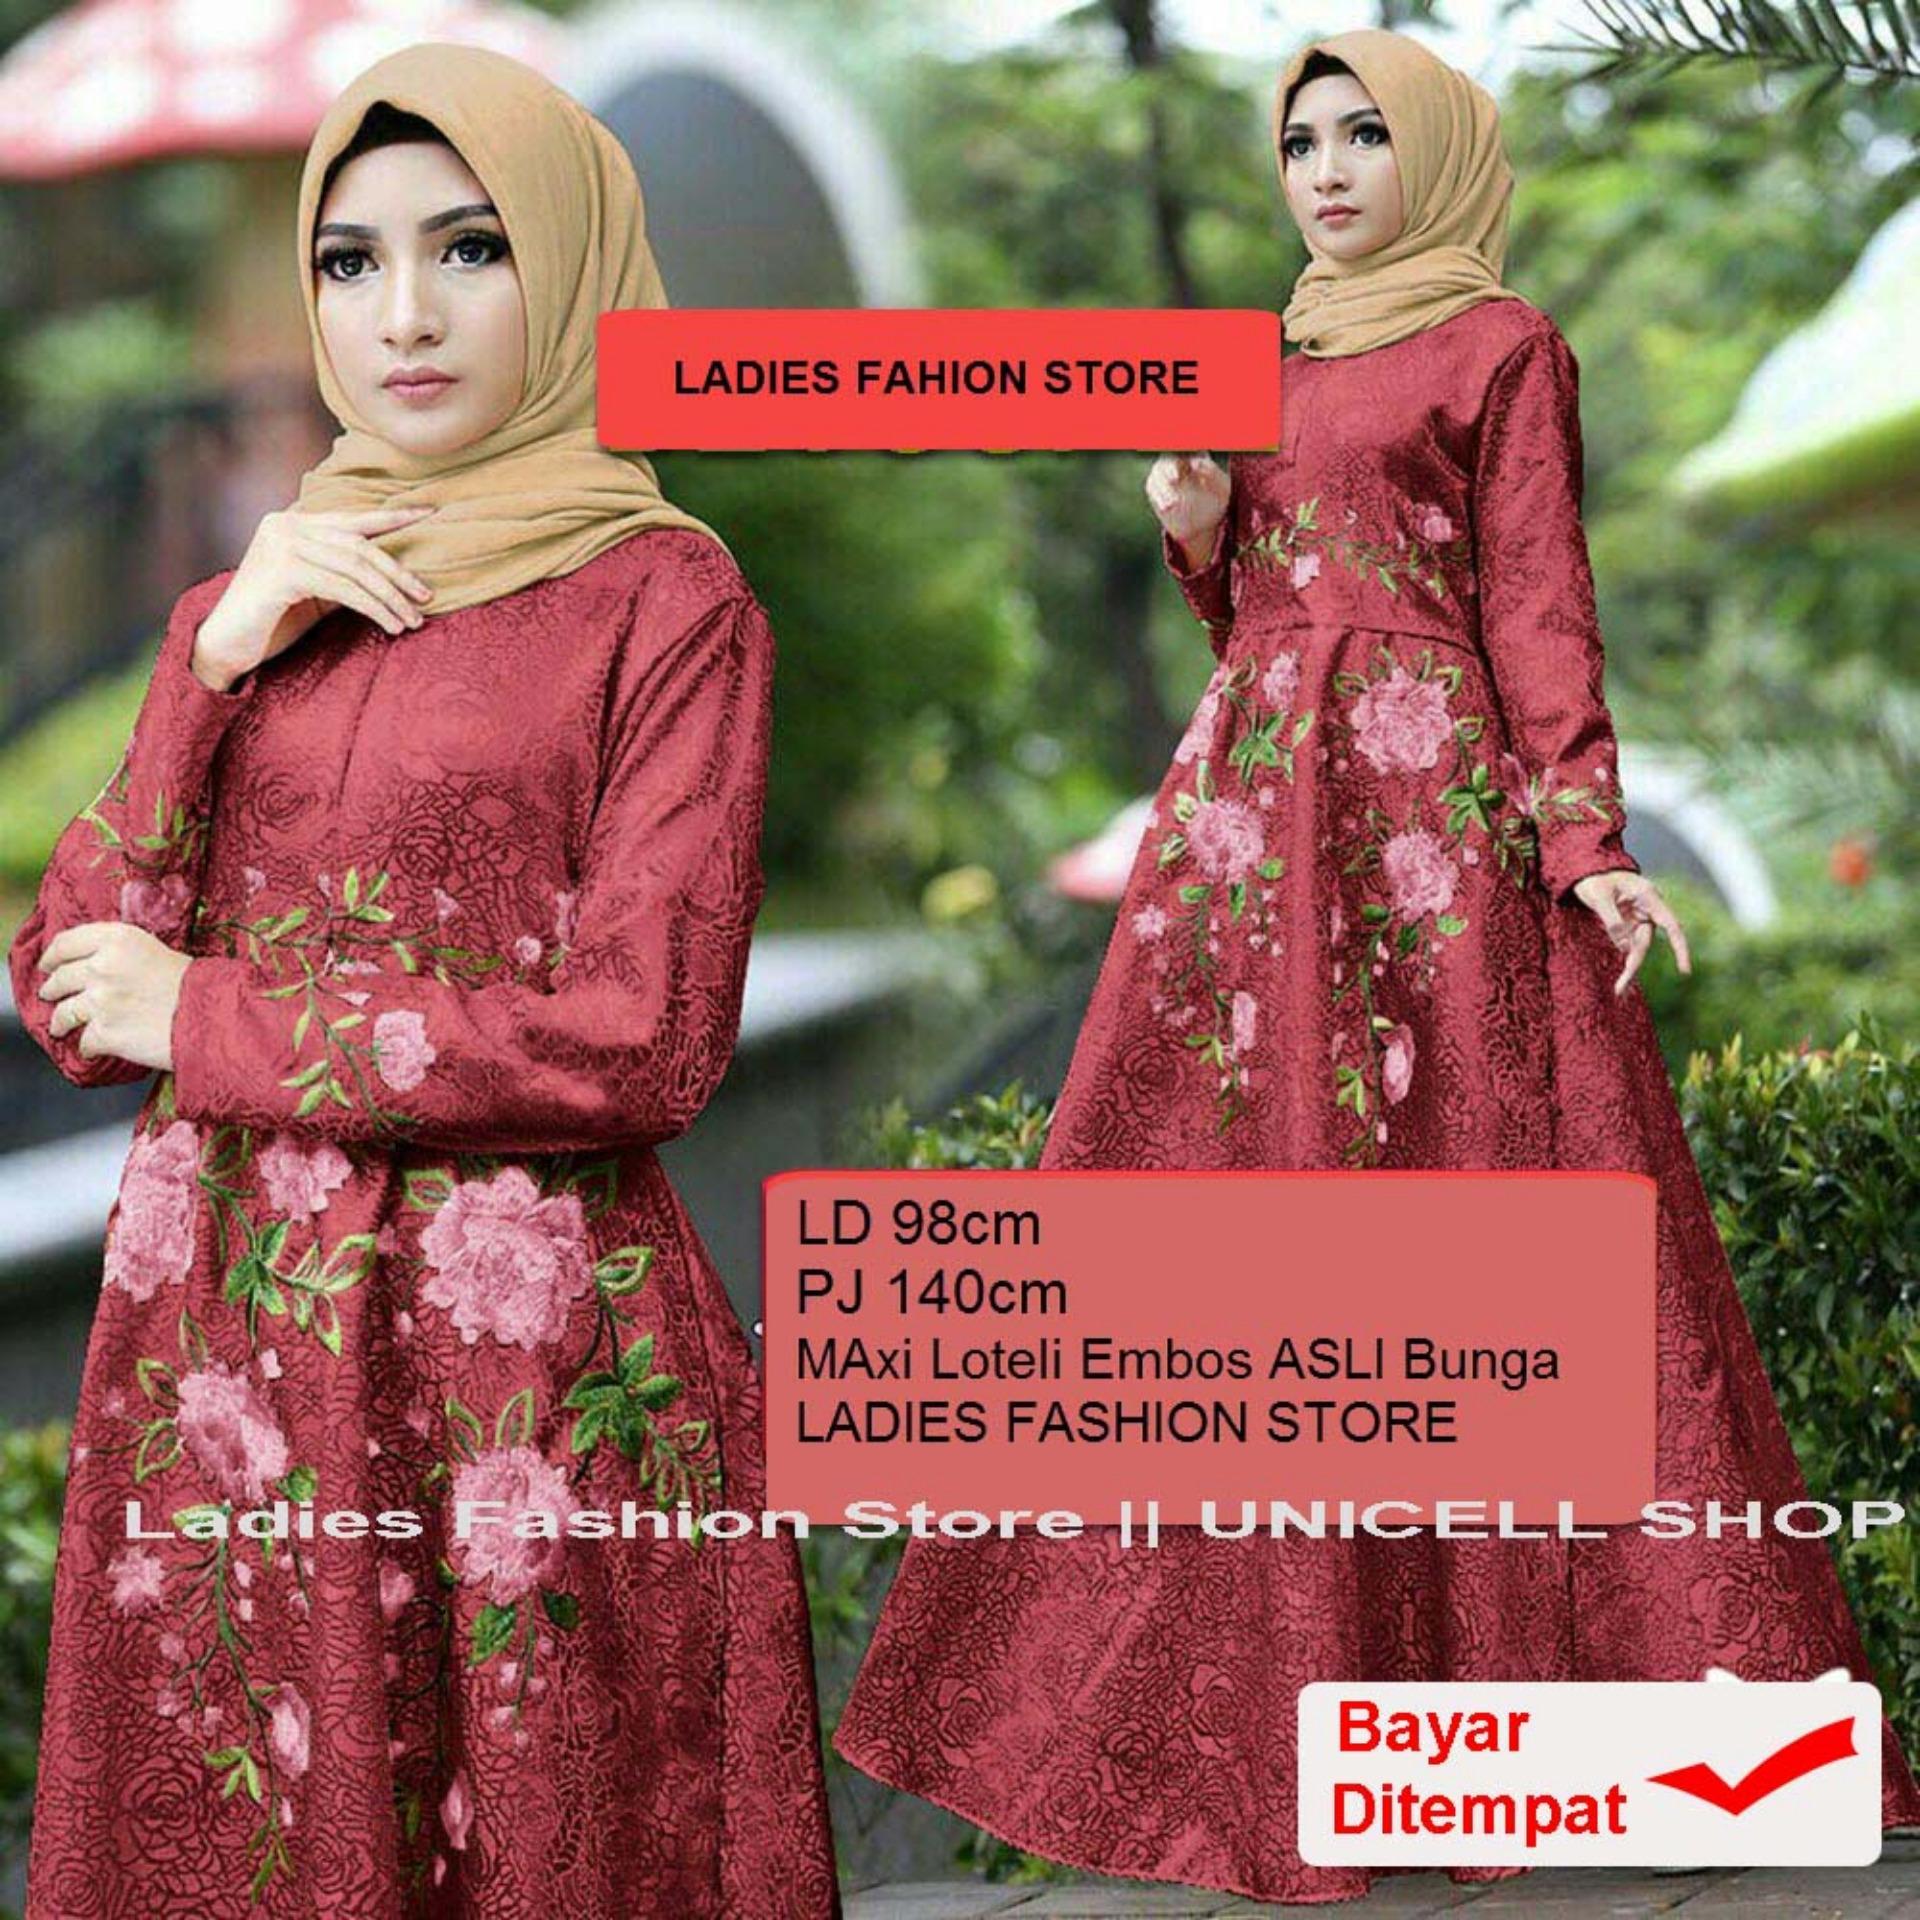 Gamis Terbaru 2019 Dress Gamis Muslim Iyana/ Set Terusan Maxi Hijab Syar'i/ Syari Simple Elegant / Baju Muslimah Wanita / Kebaya Modern Baloteli Tanpa Pasmina (anaay) SS - Maroon / Gaun Pesta